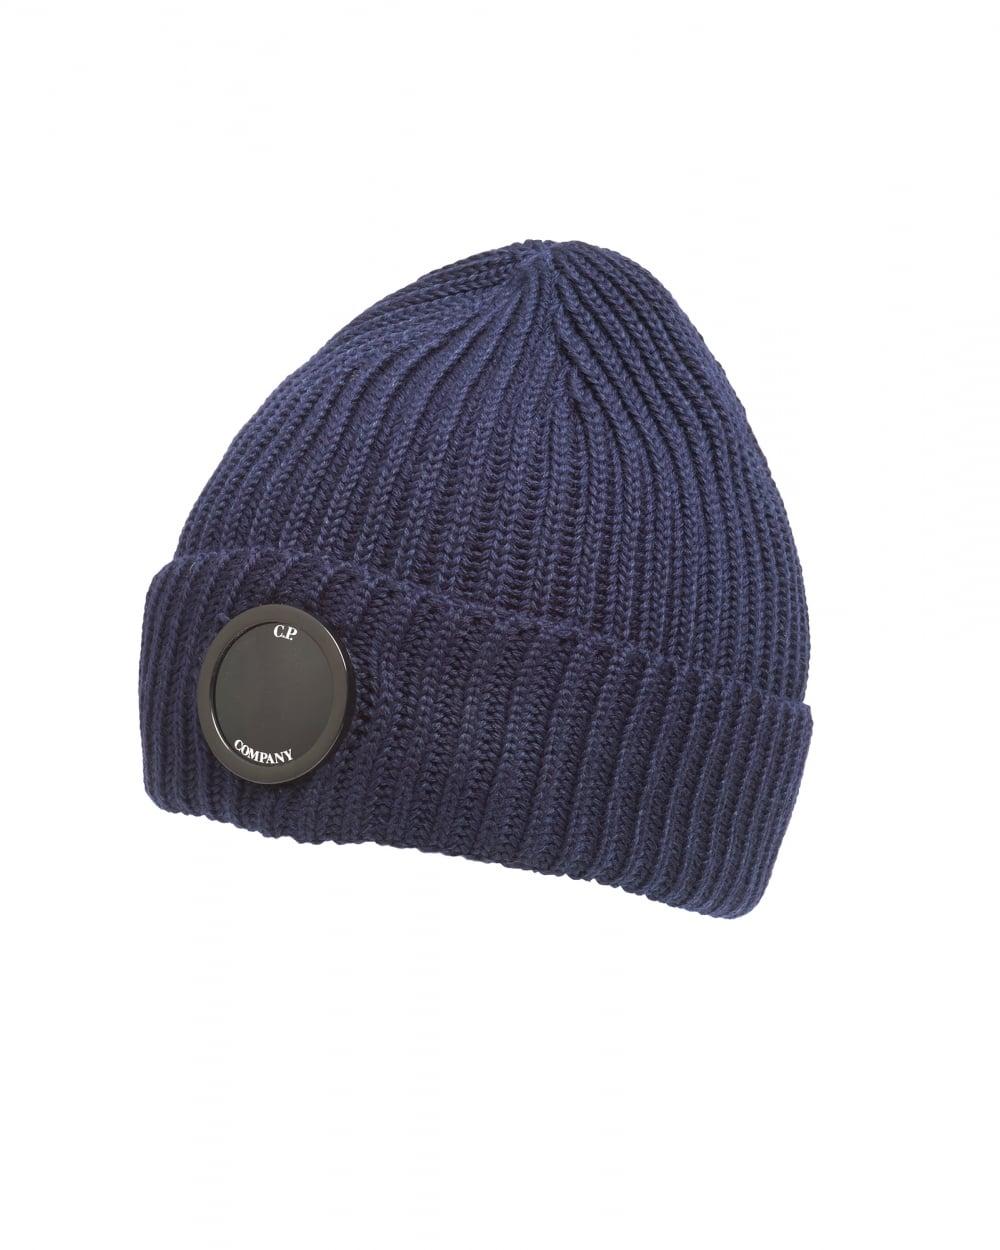 fb728ef4b86 C.P Company Mens Navy Blue Goggle Lens Ribbed Beanie Hat